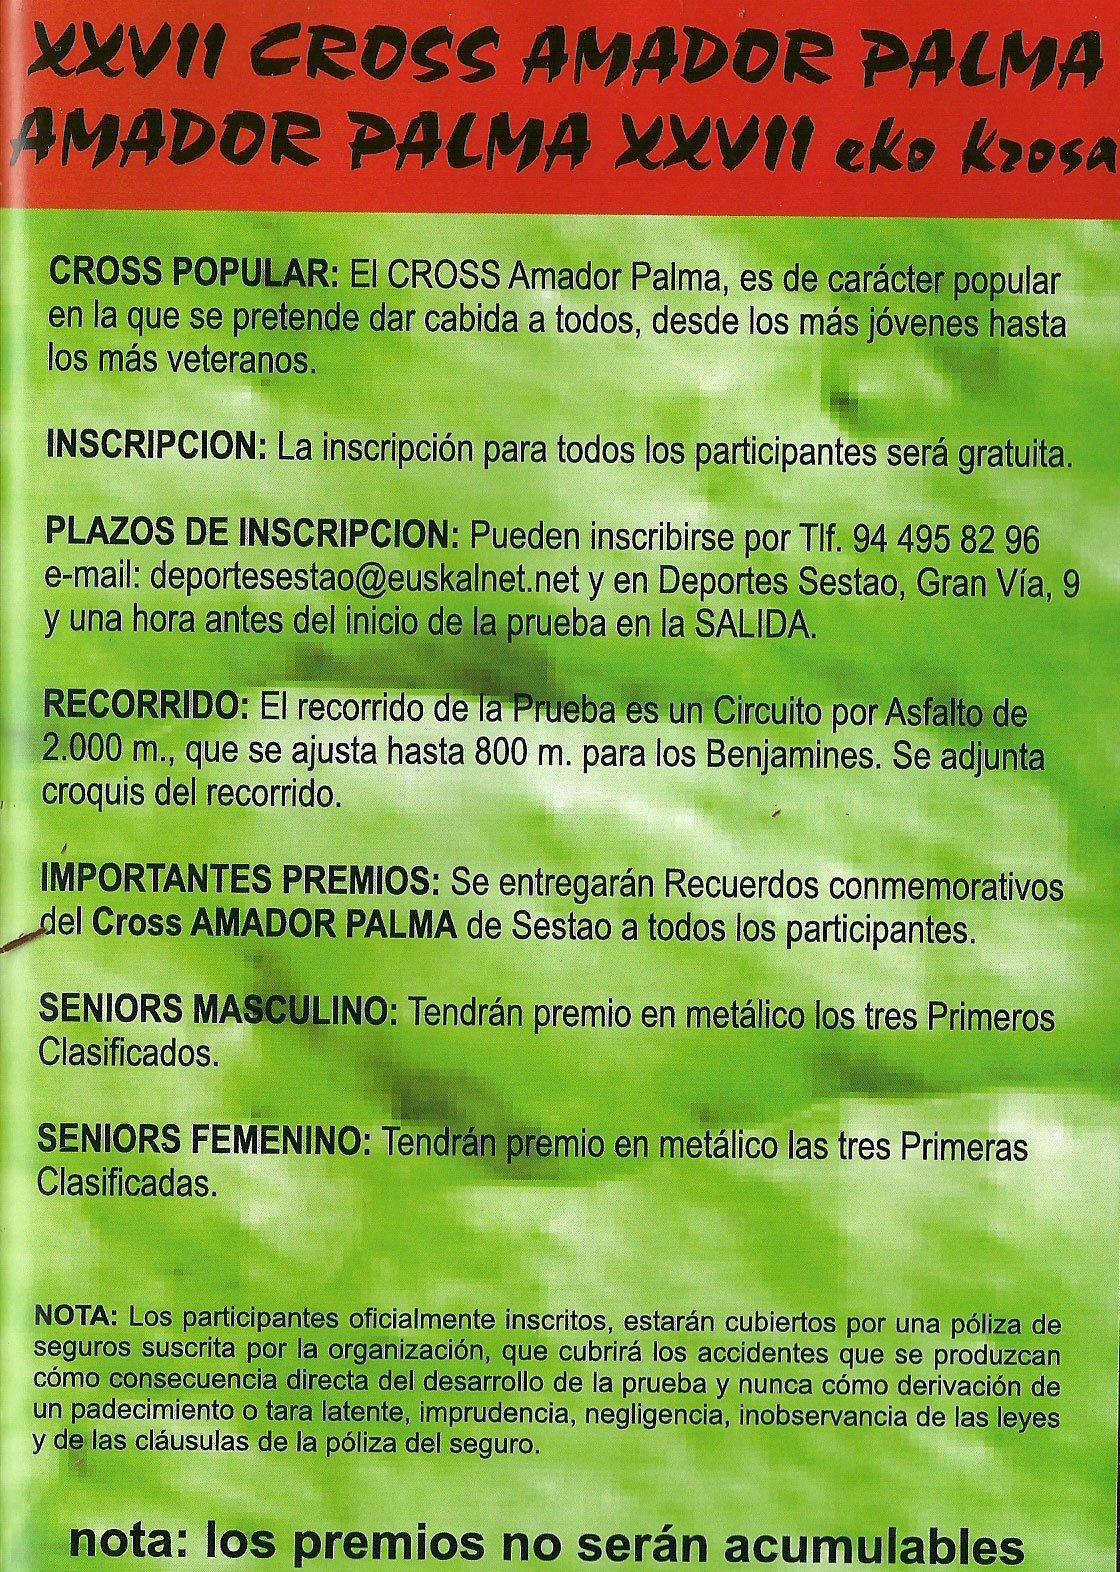 CROSS AMADOR DE PALMA